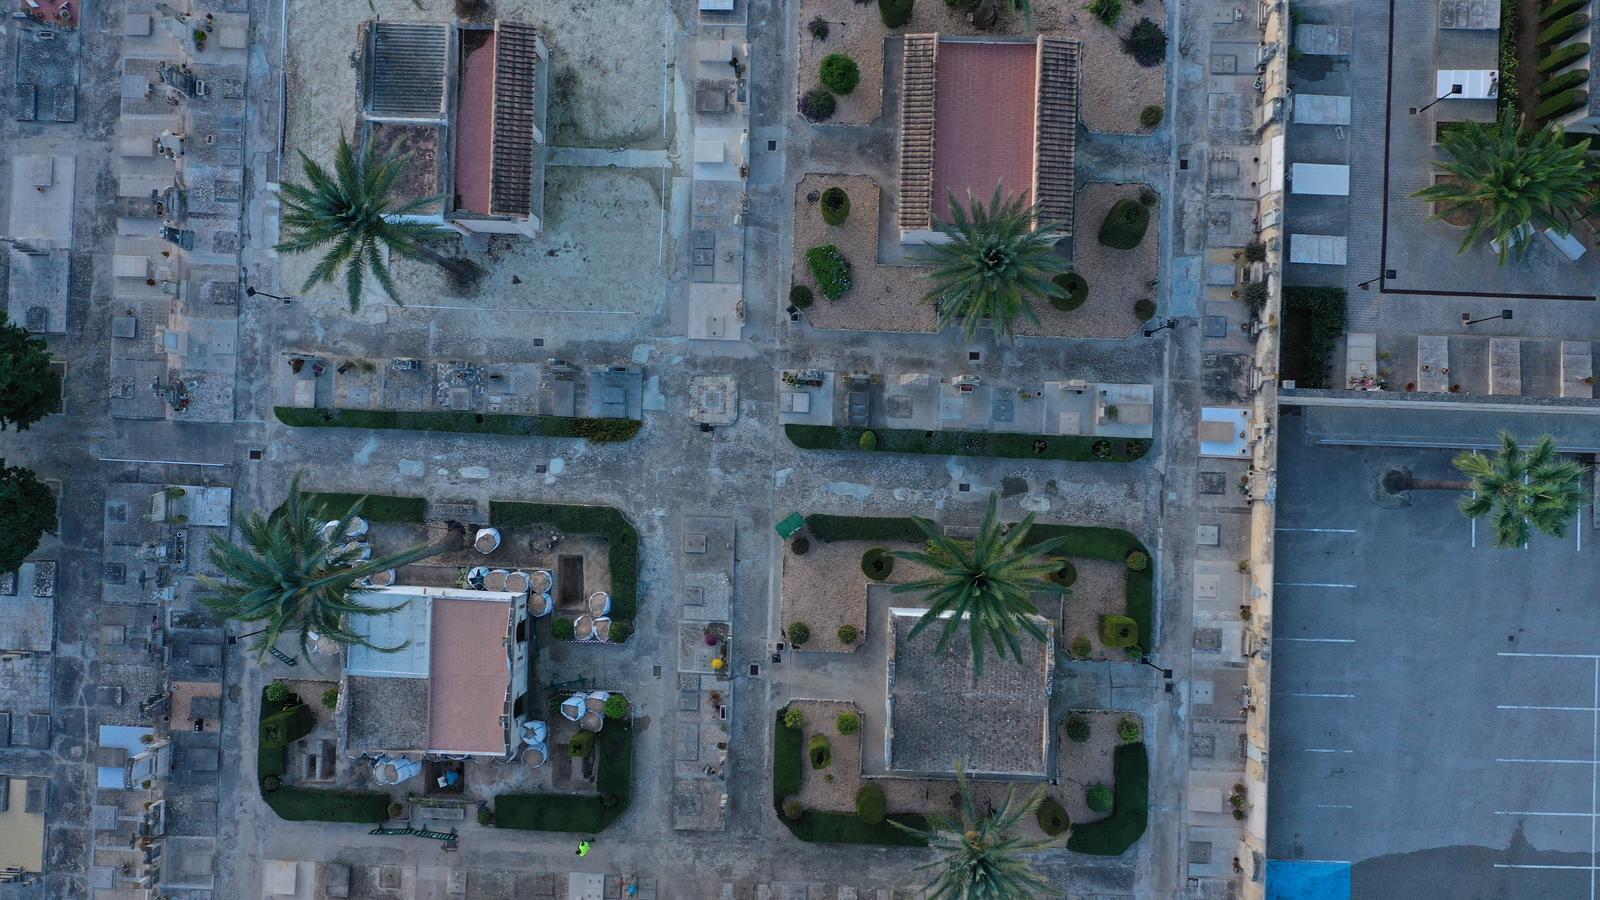 Fotografia aèria del cementeri de Porreres.